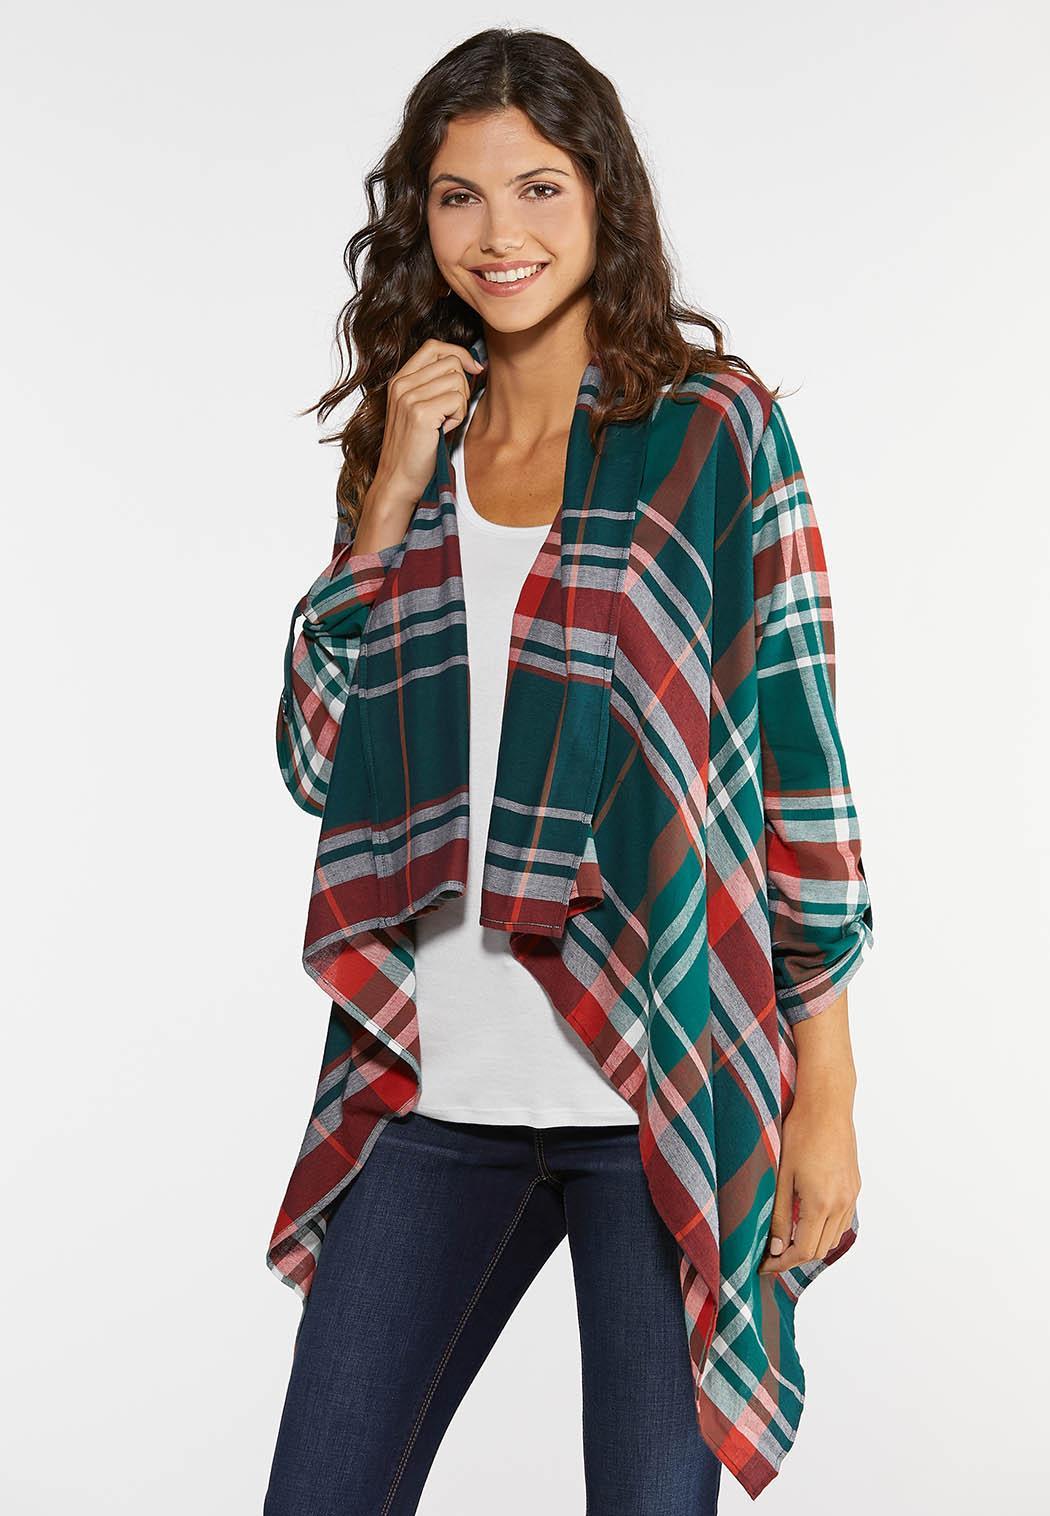 Autumn Green Plaid Jacket